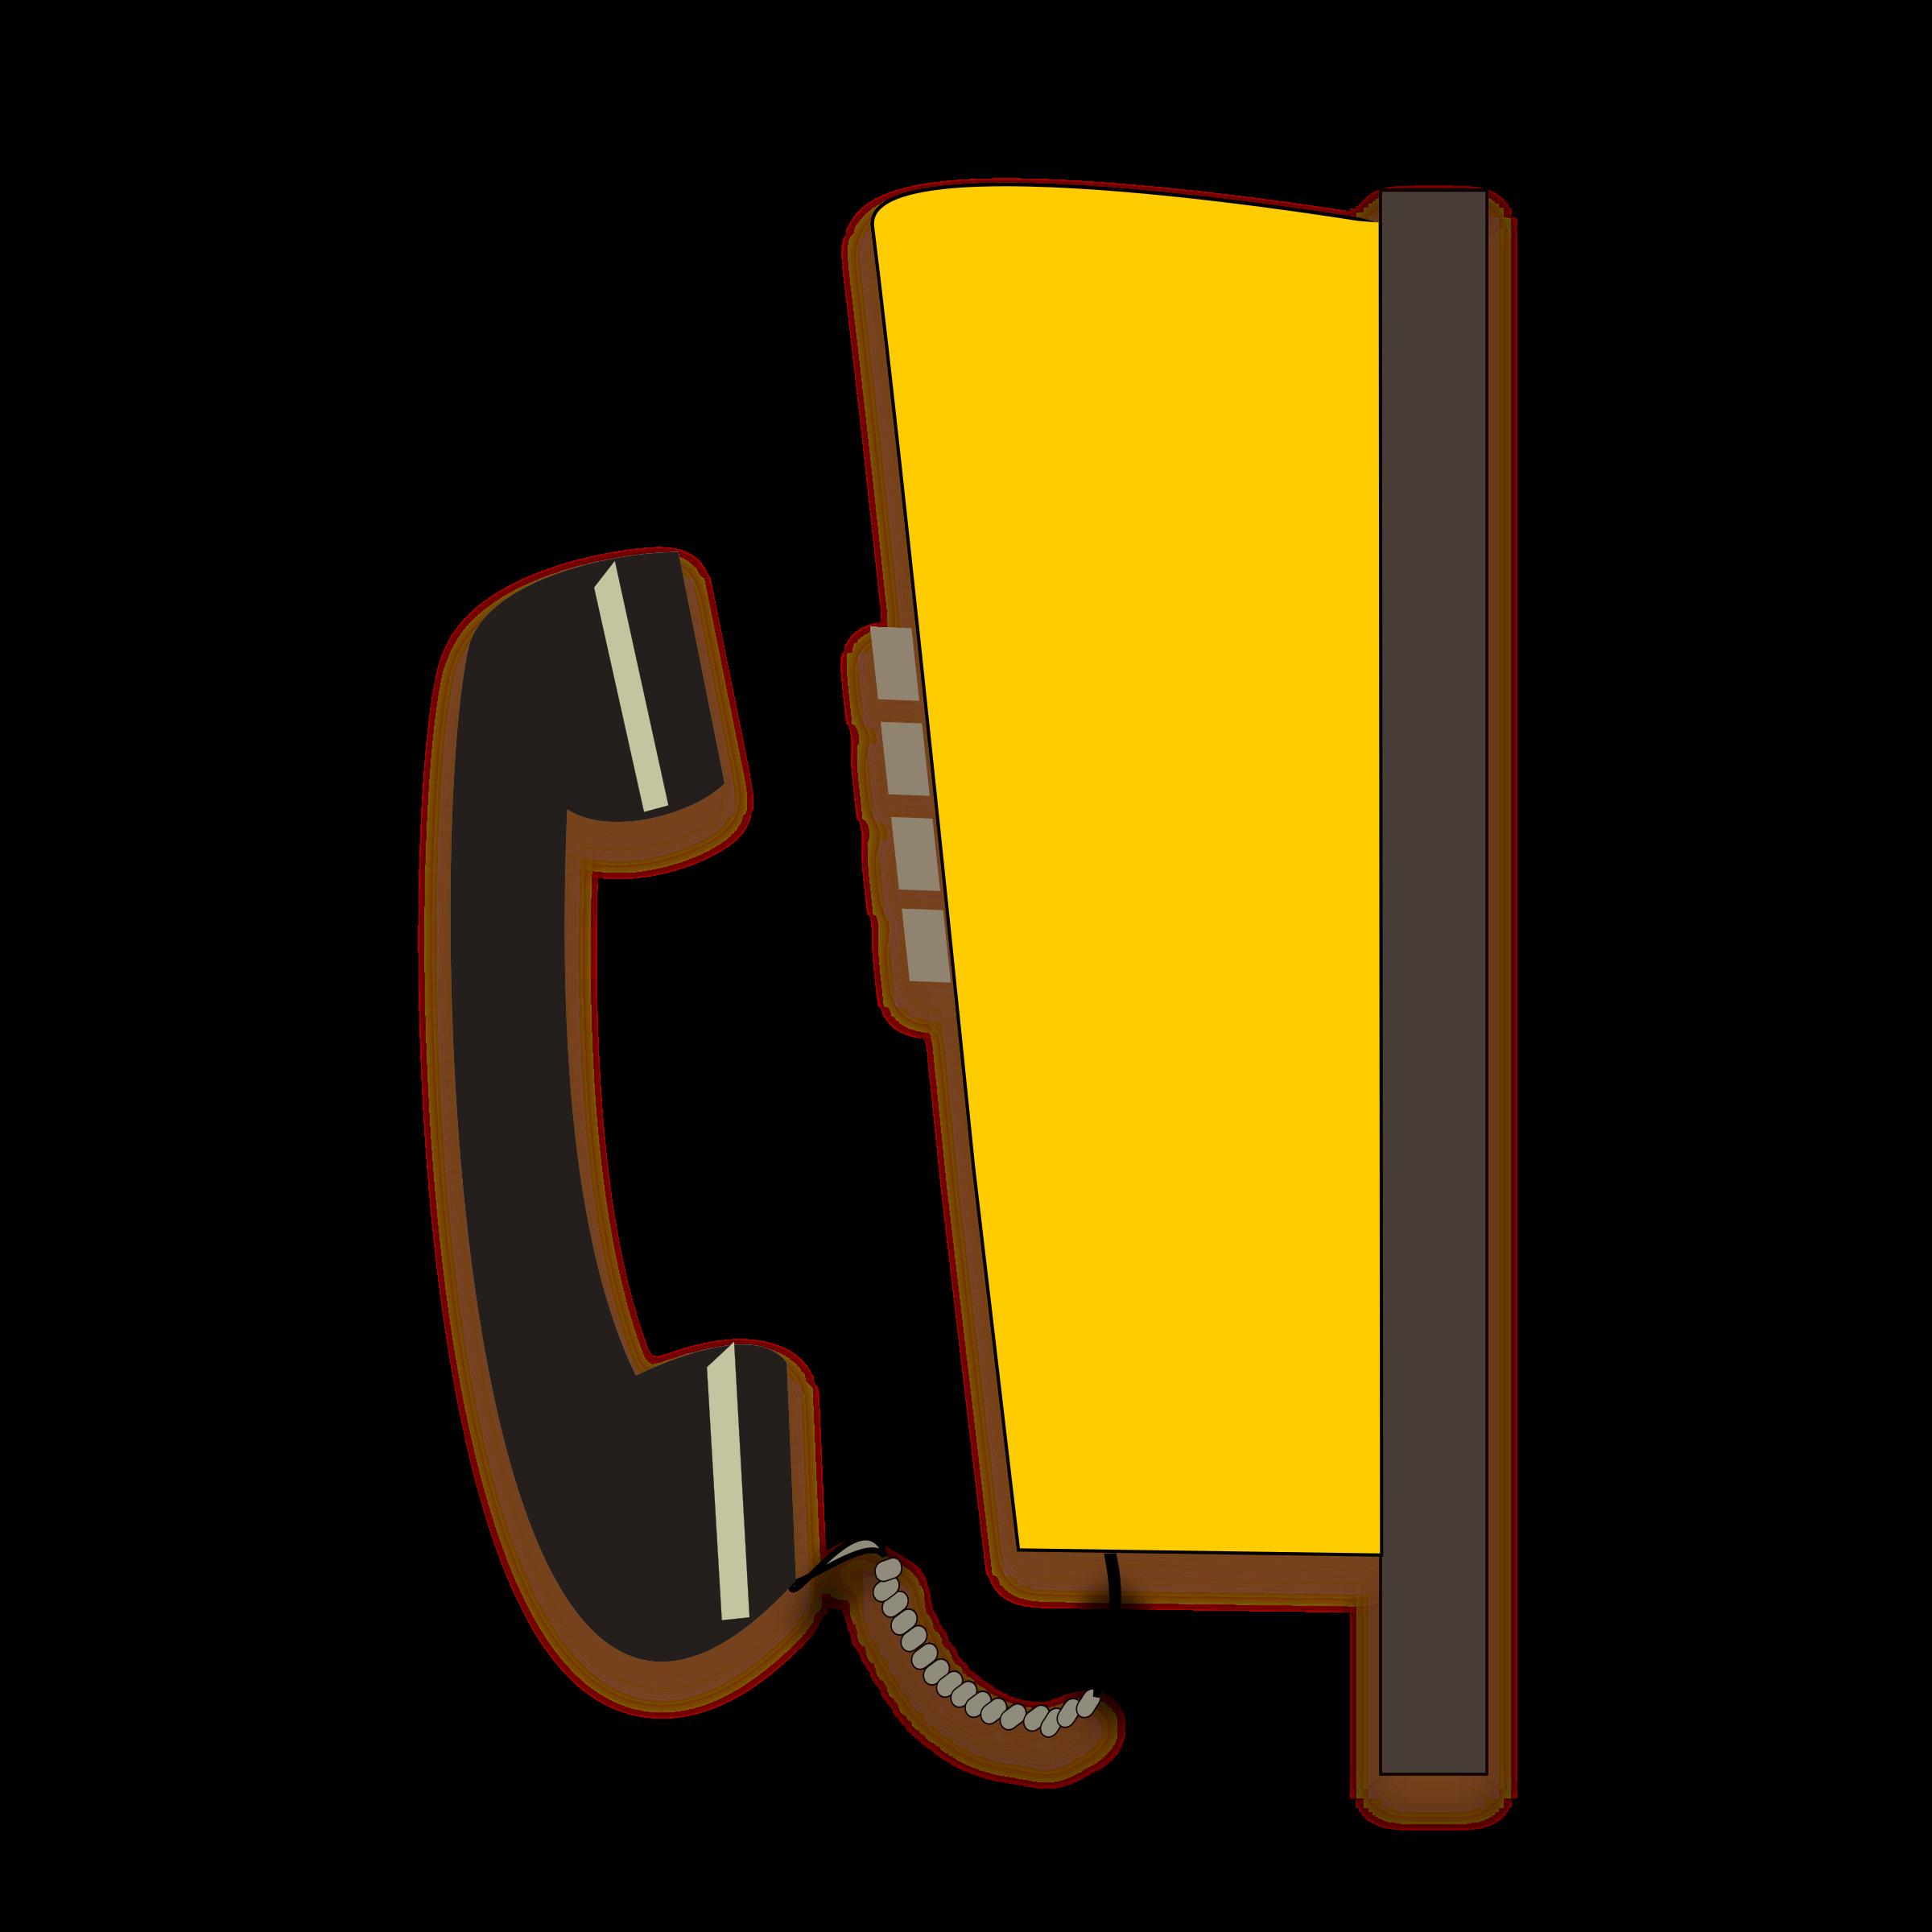 Phone clipart yellow. Public telephone big image